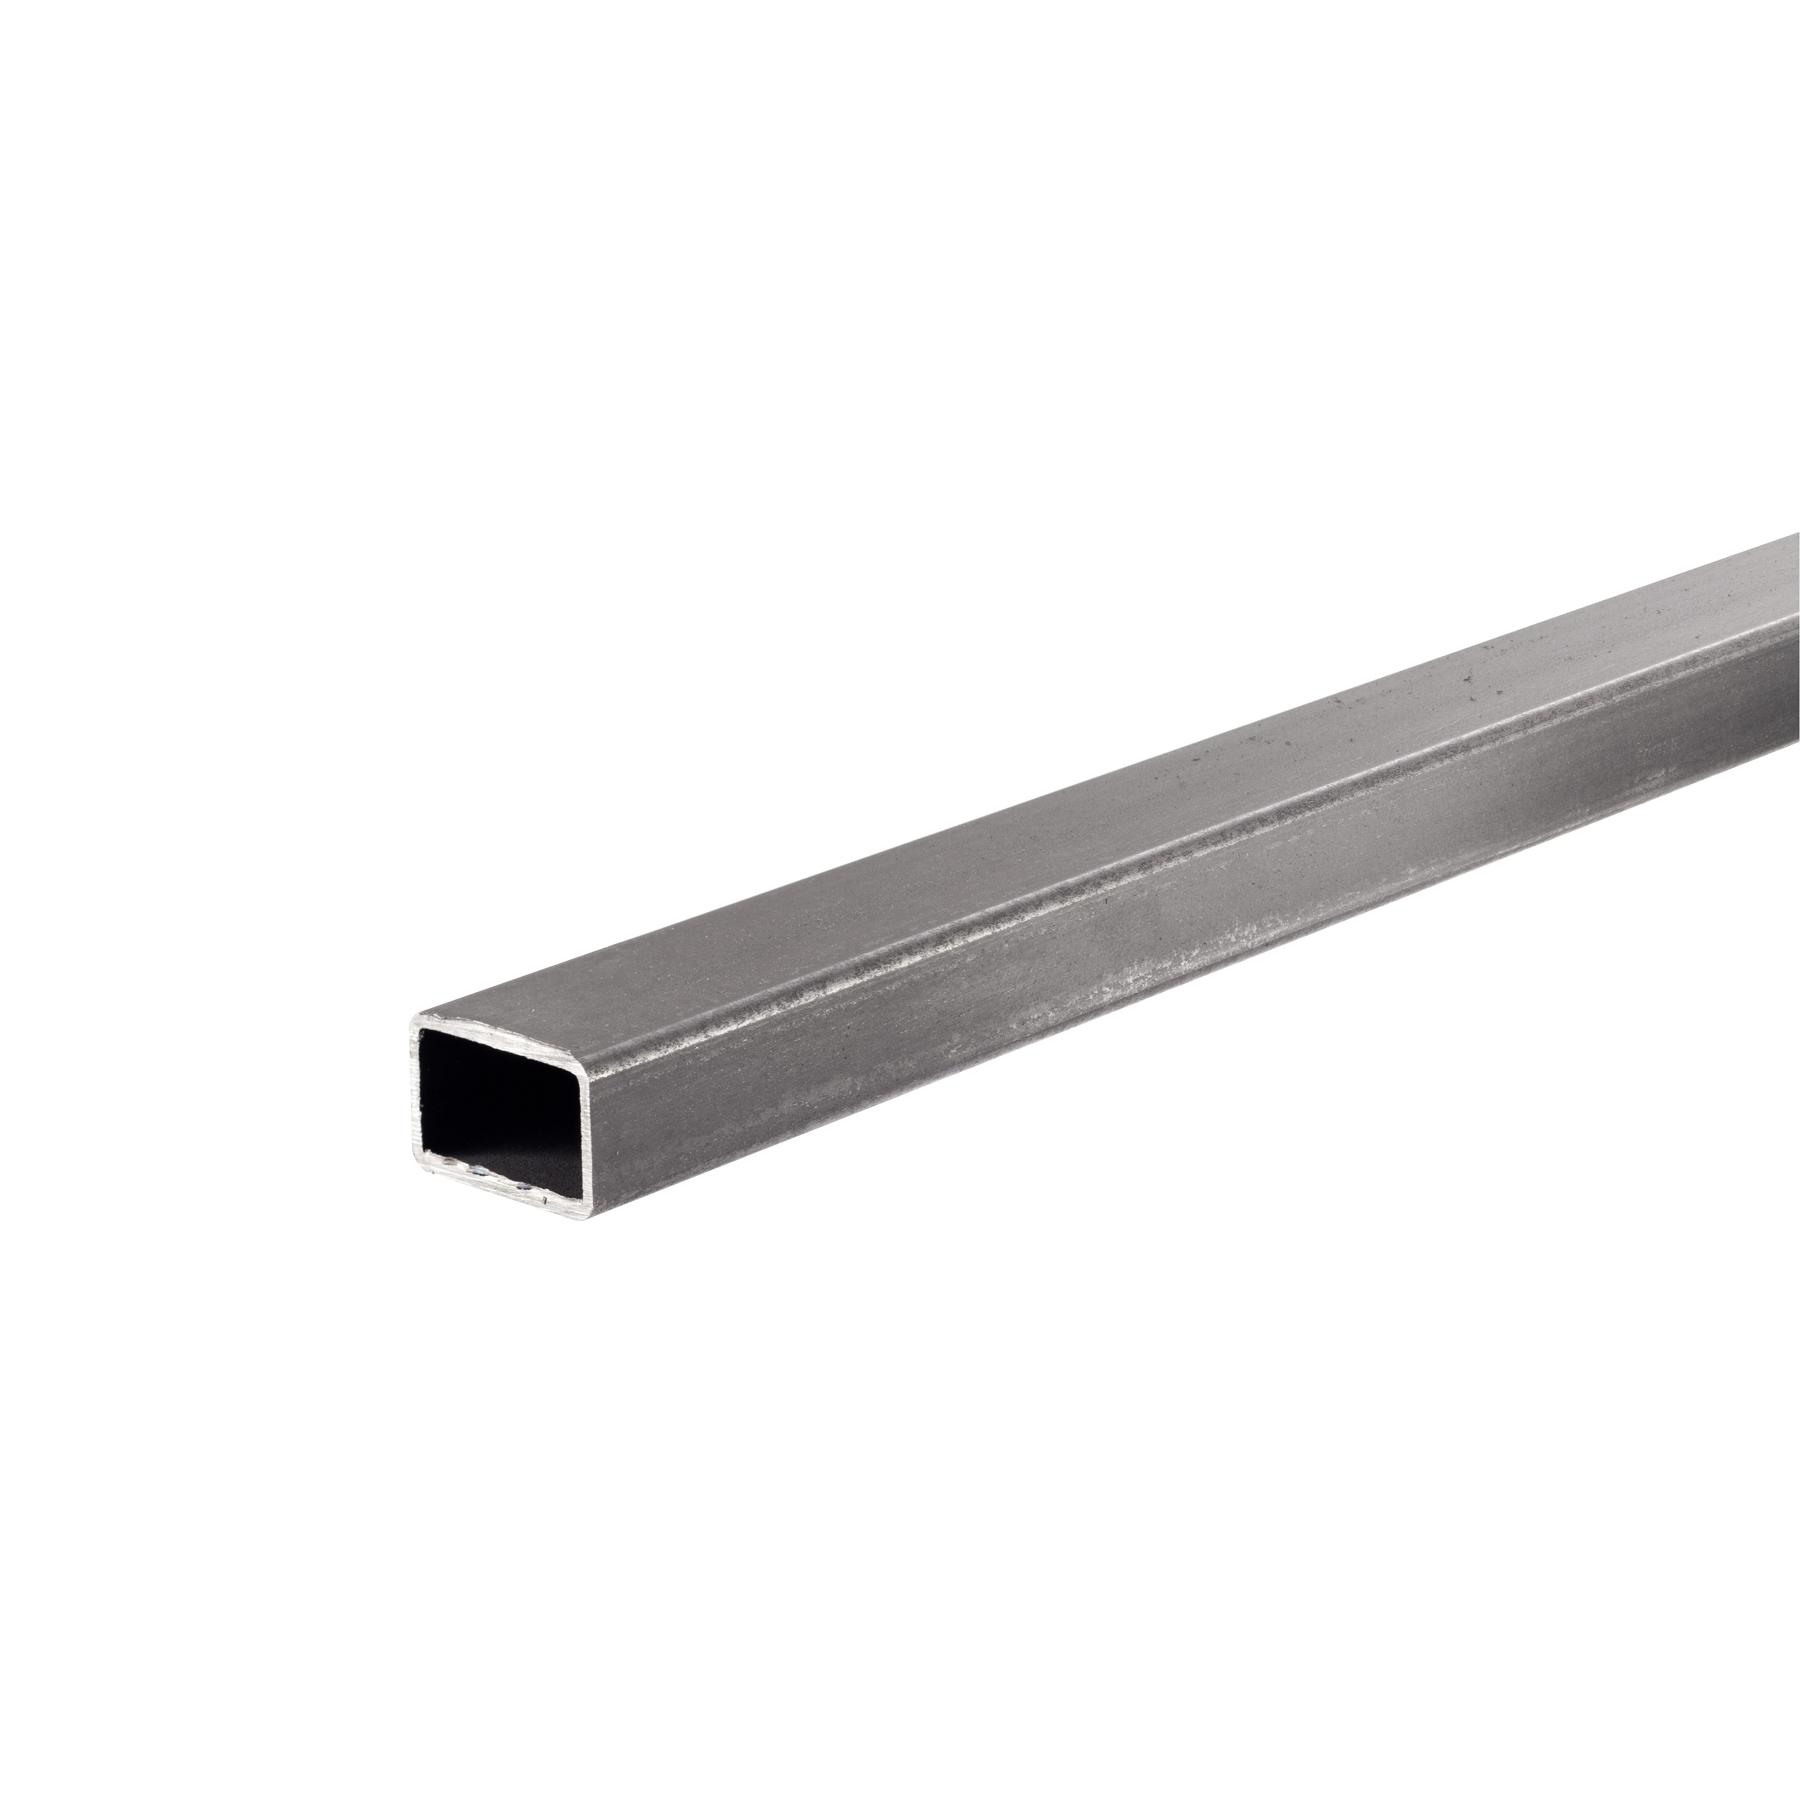 Perfil Tubo Retangular Aço 1mx3cm